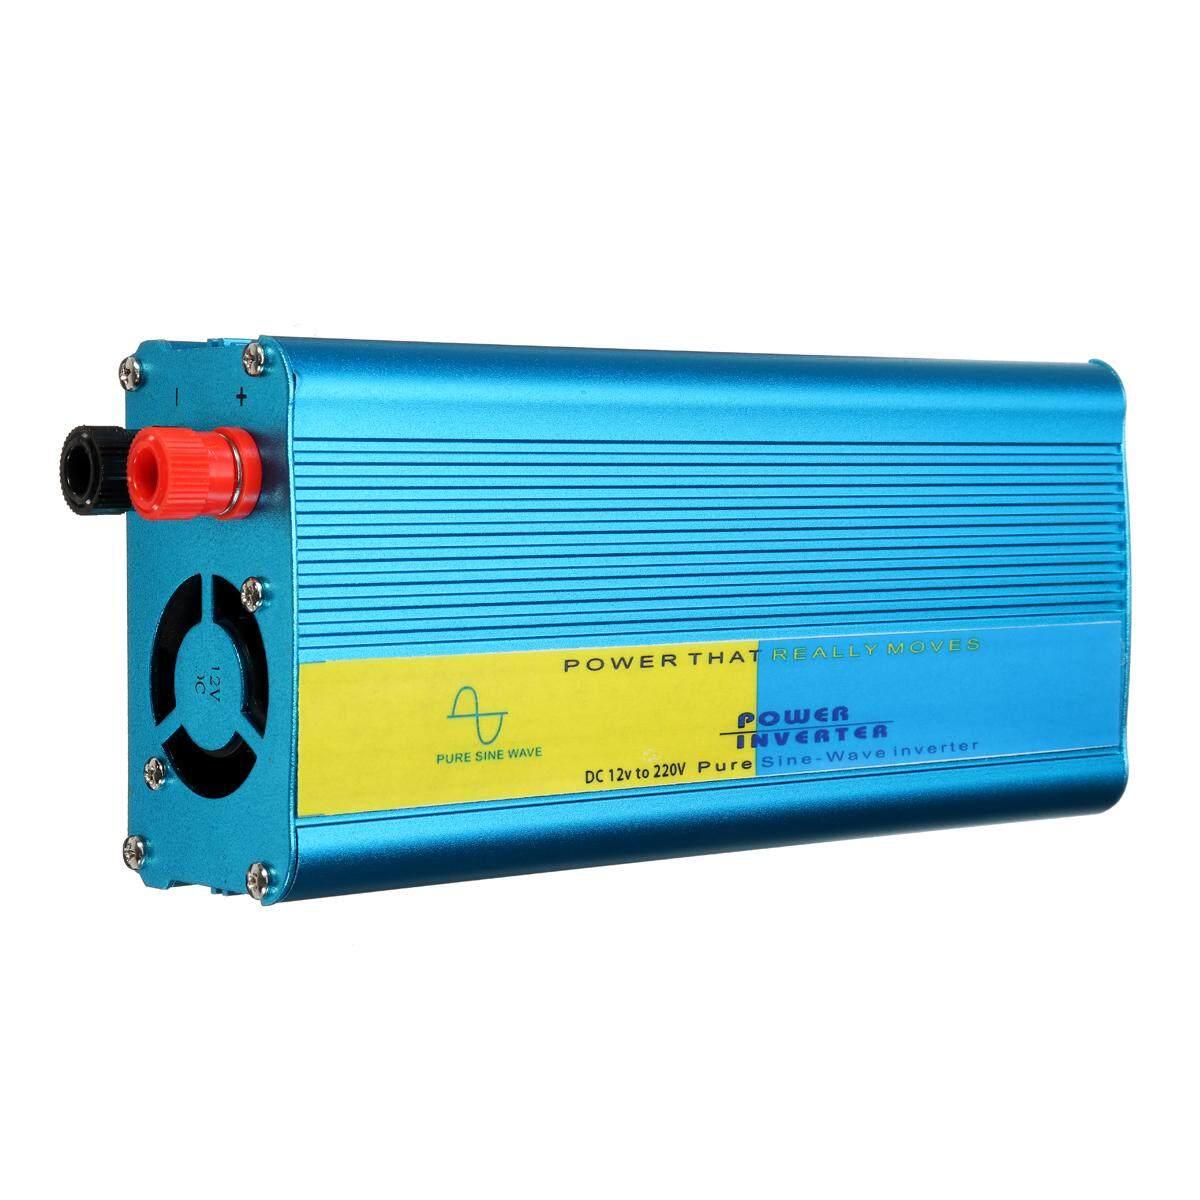 500 W/1200 W Pure Sine Wave Converter Pengalih Daya Caravan DC 12 V untuk AC 220 V